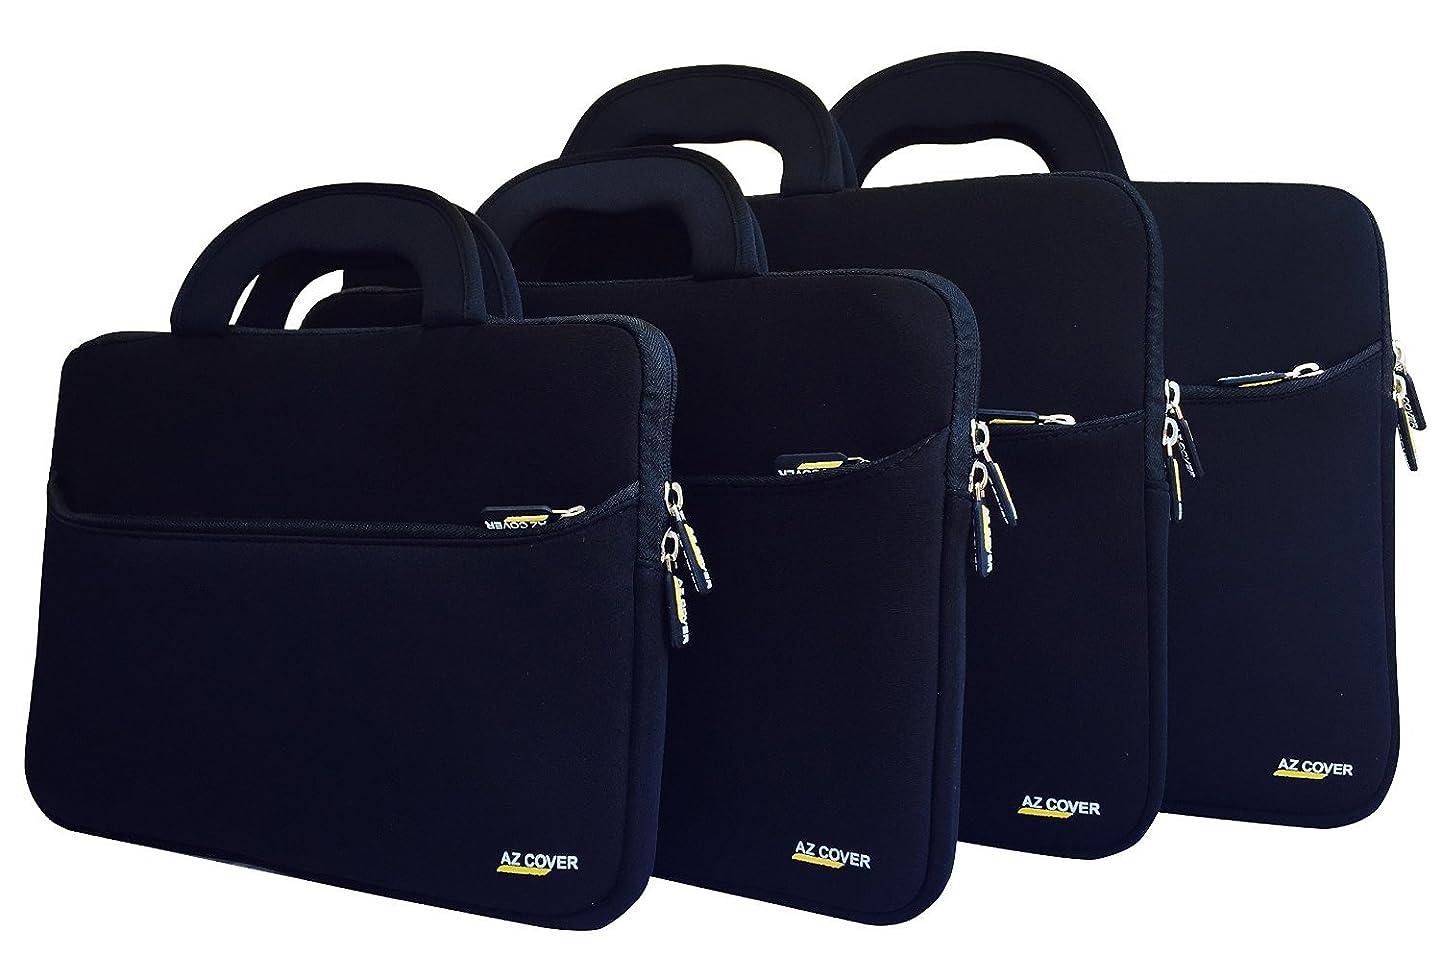 AZ-Cover 15.6-Inch Laptop Sleeve Case Bag (Black) With Handle For Acer Aspire E5-521-83CV/E5-551-T5SV/E5-571-30VE/E5-571-37SY/E5-571-53S1/E5-571-588M 15.6